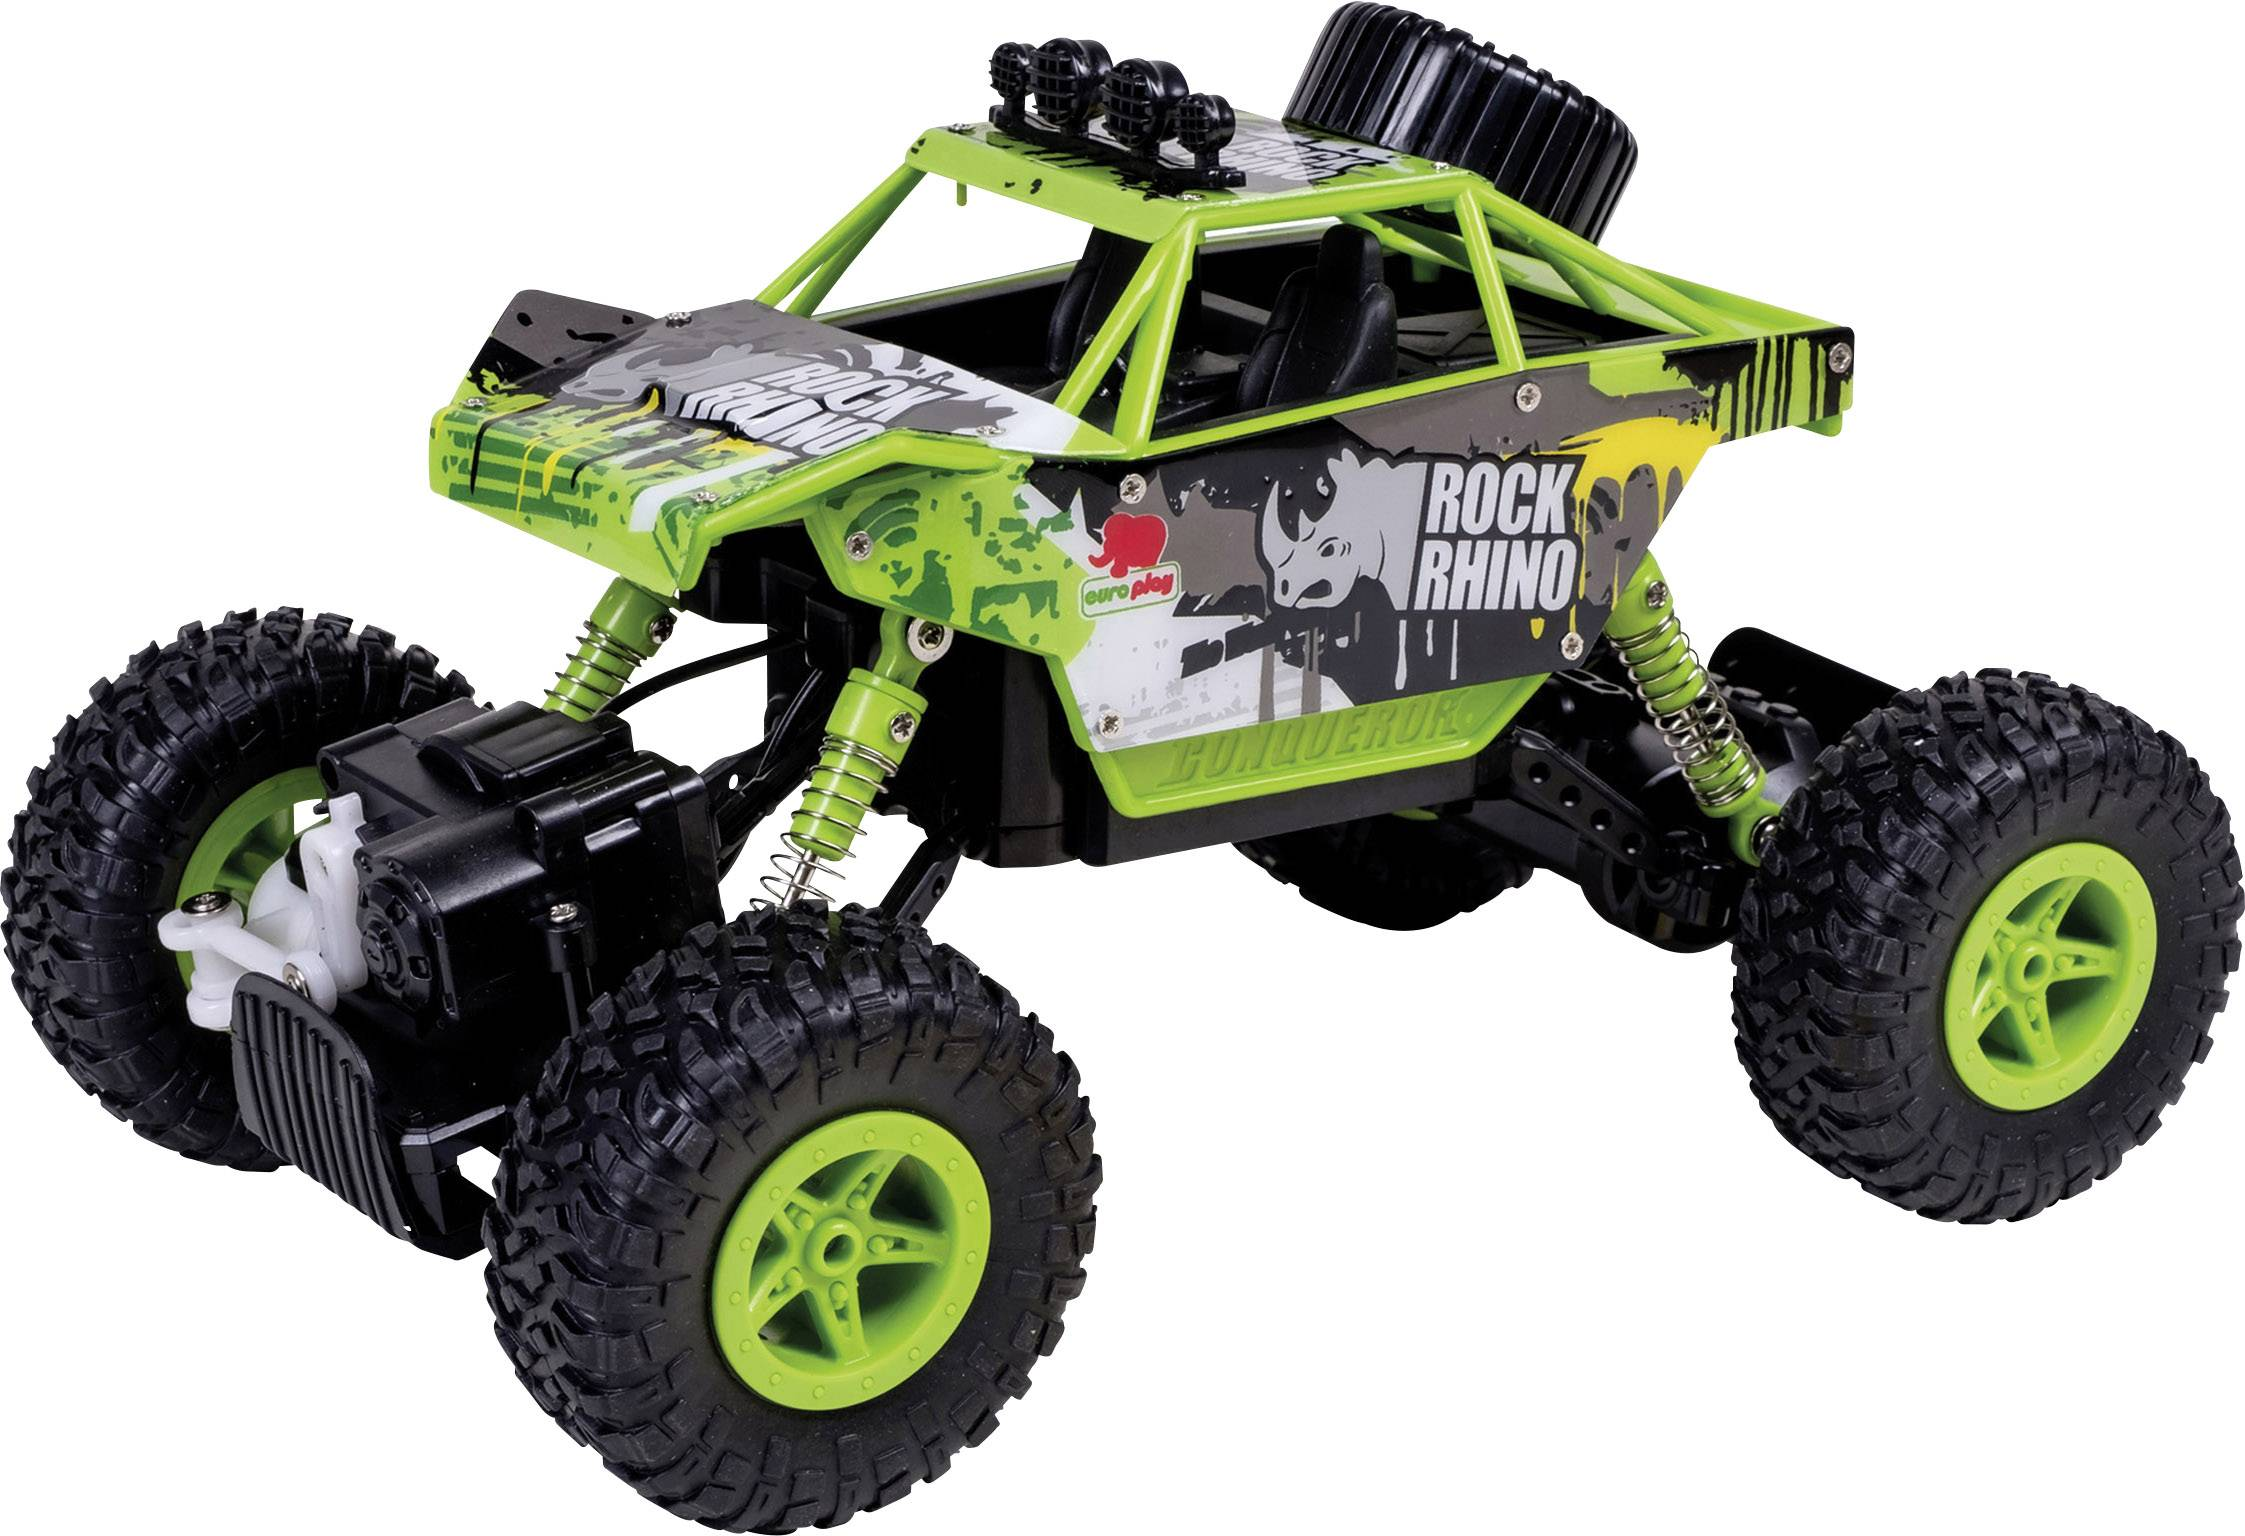 euro play 30079 Rock Rhino RC model car for beginners